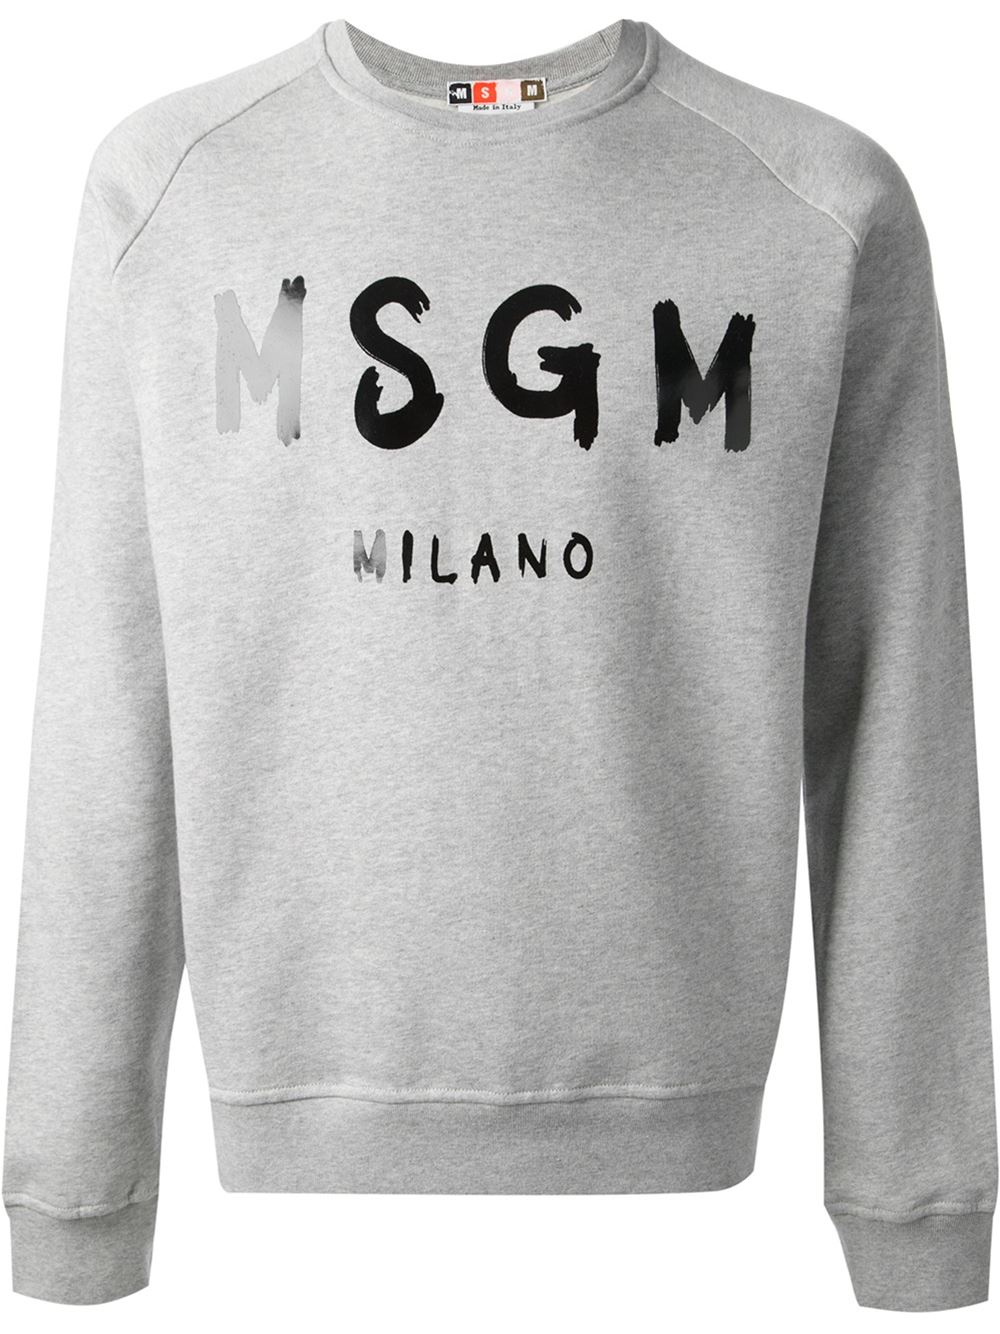 ebcf9ad67e Lyst - MSGM Logo Sweatshirt in Gray for Men